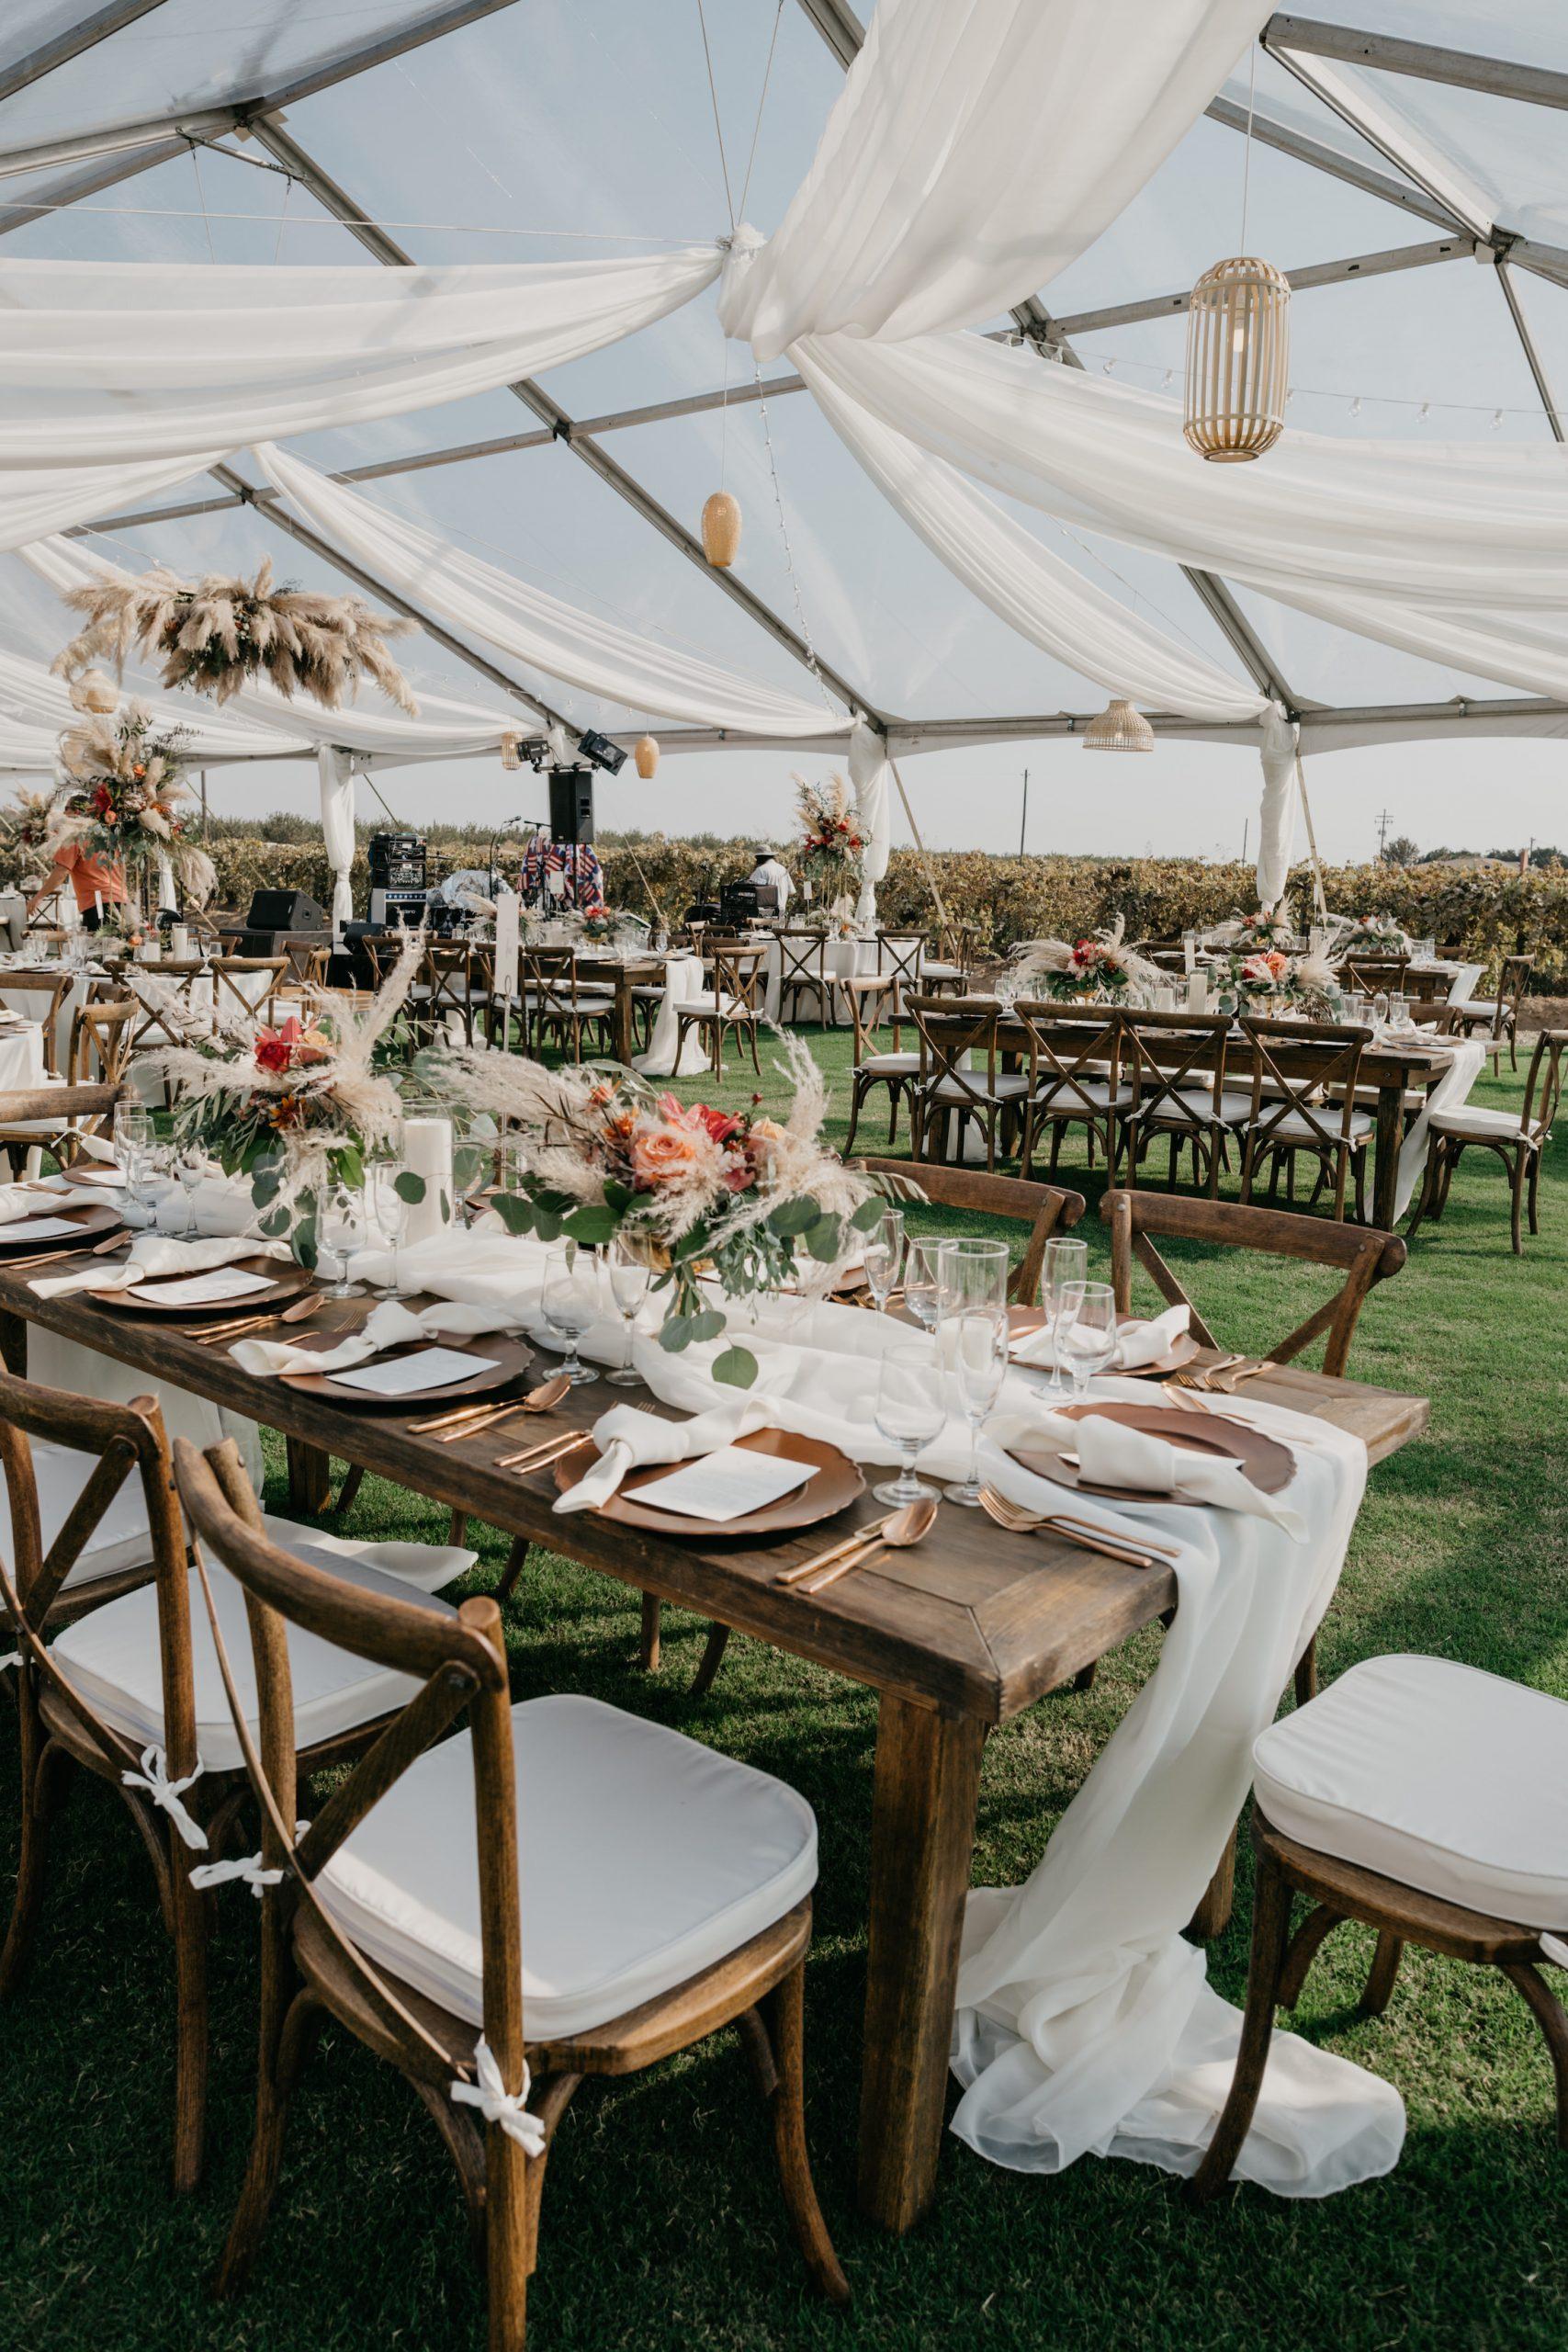 Evanelle Vineyards Wedding Reception Tables, image by Fatima Elreda Photo